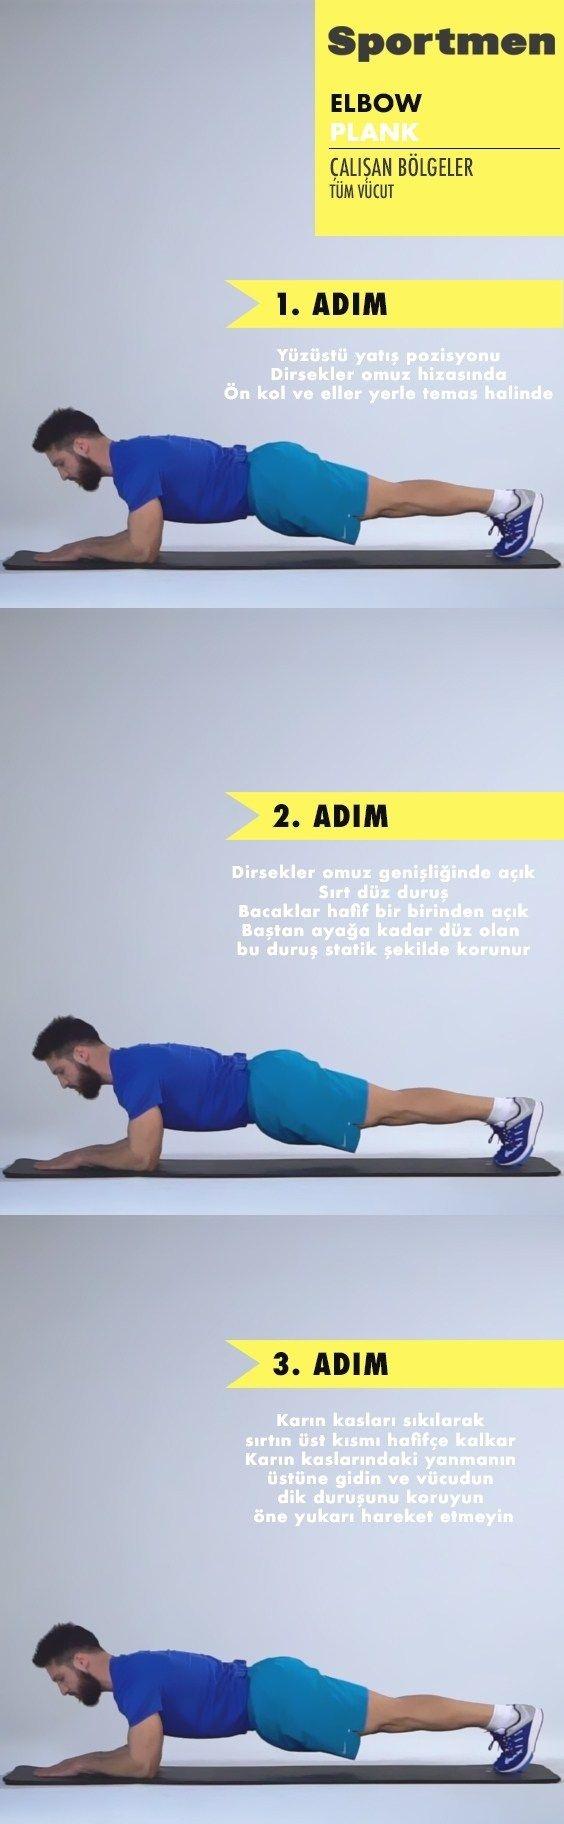 Kar?n, s?rt ve bacak kaslar?n? çal??t?ran elbow plank egzersizi nas?l yap?l?r? #sportmen #fitness #r...